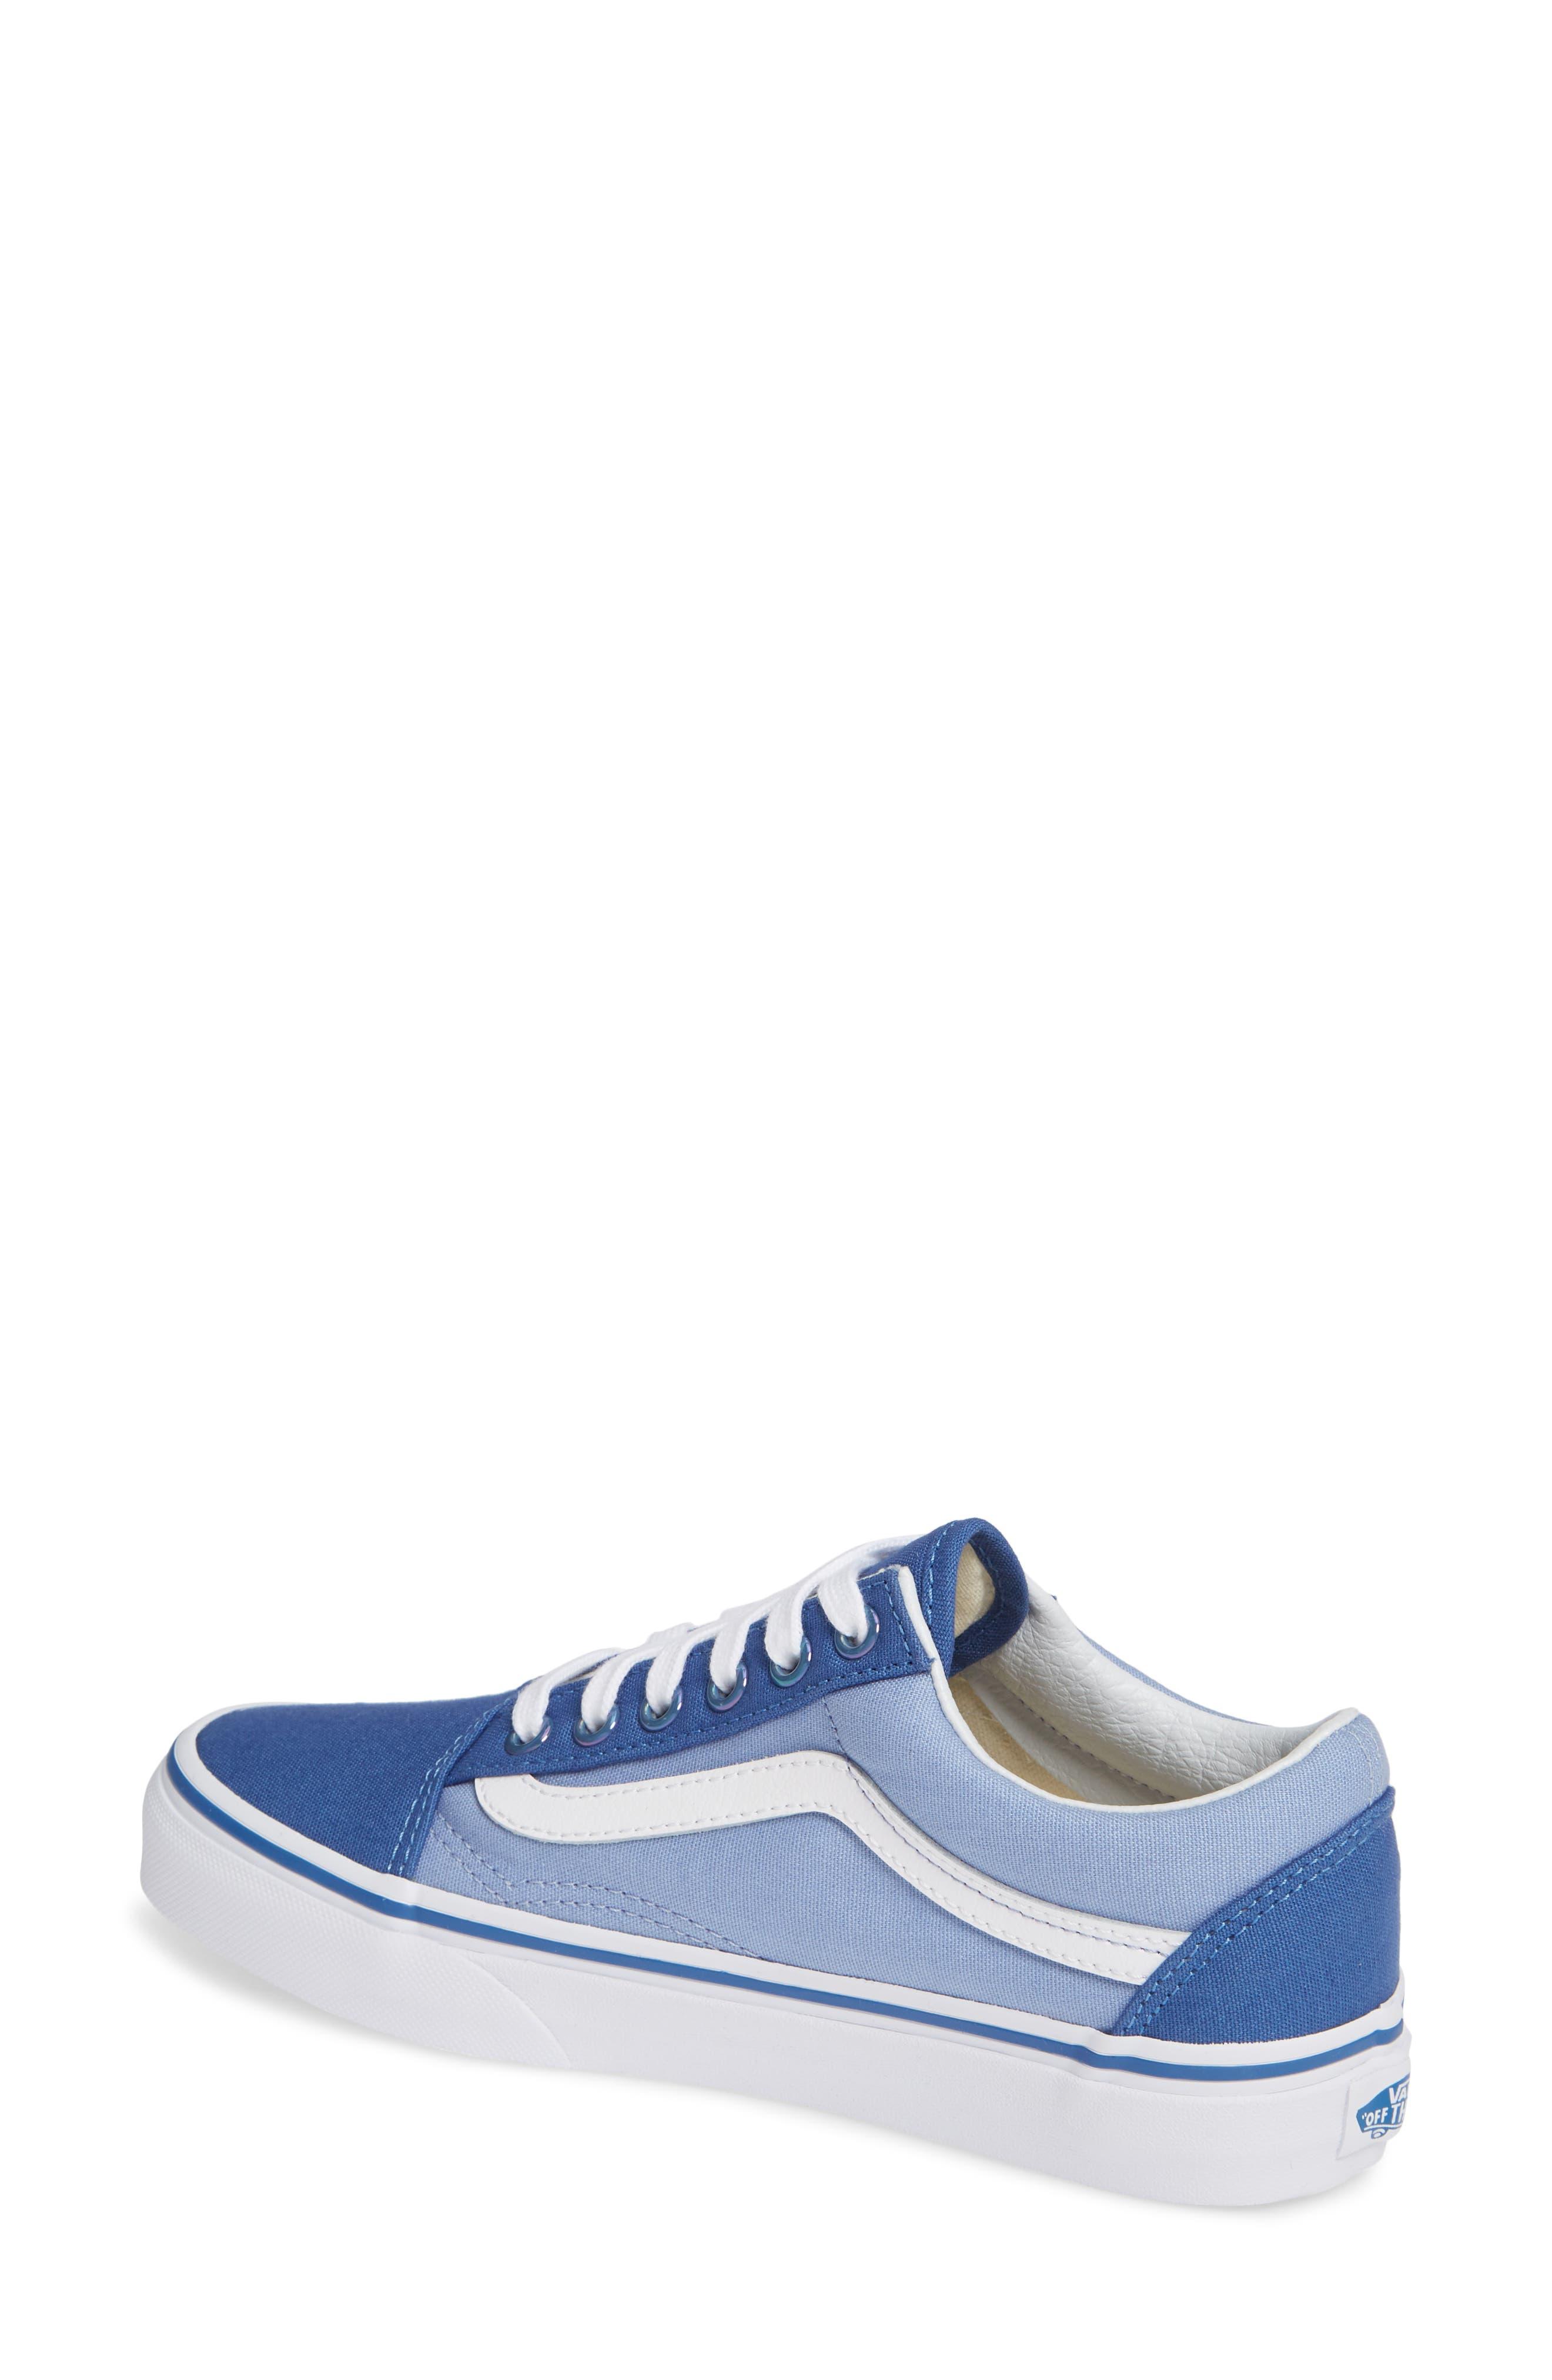 Old Skool Sneaker,                             Alternate thumbnail 2, color,                             FEDERAL BLUE/ LAVENDER LUSTER